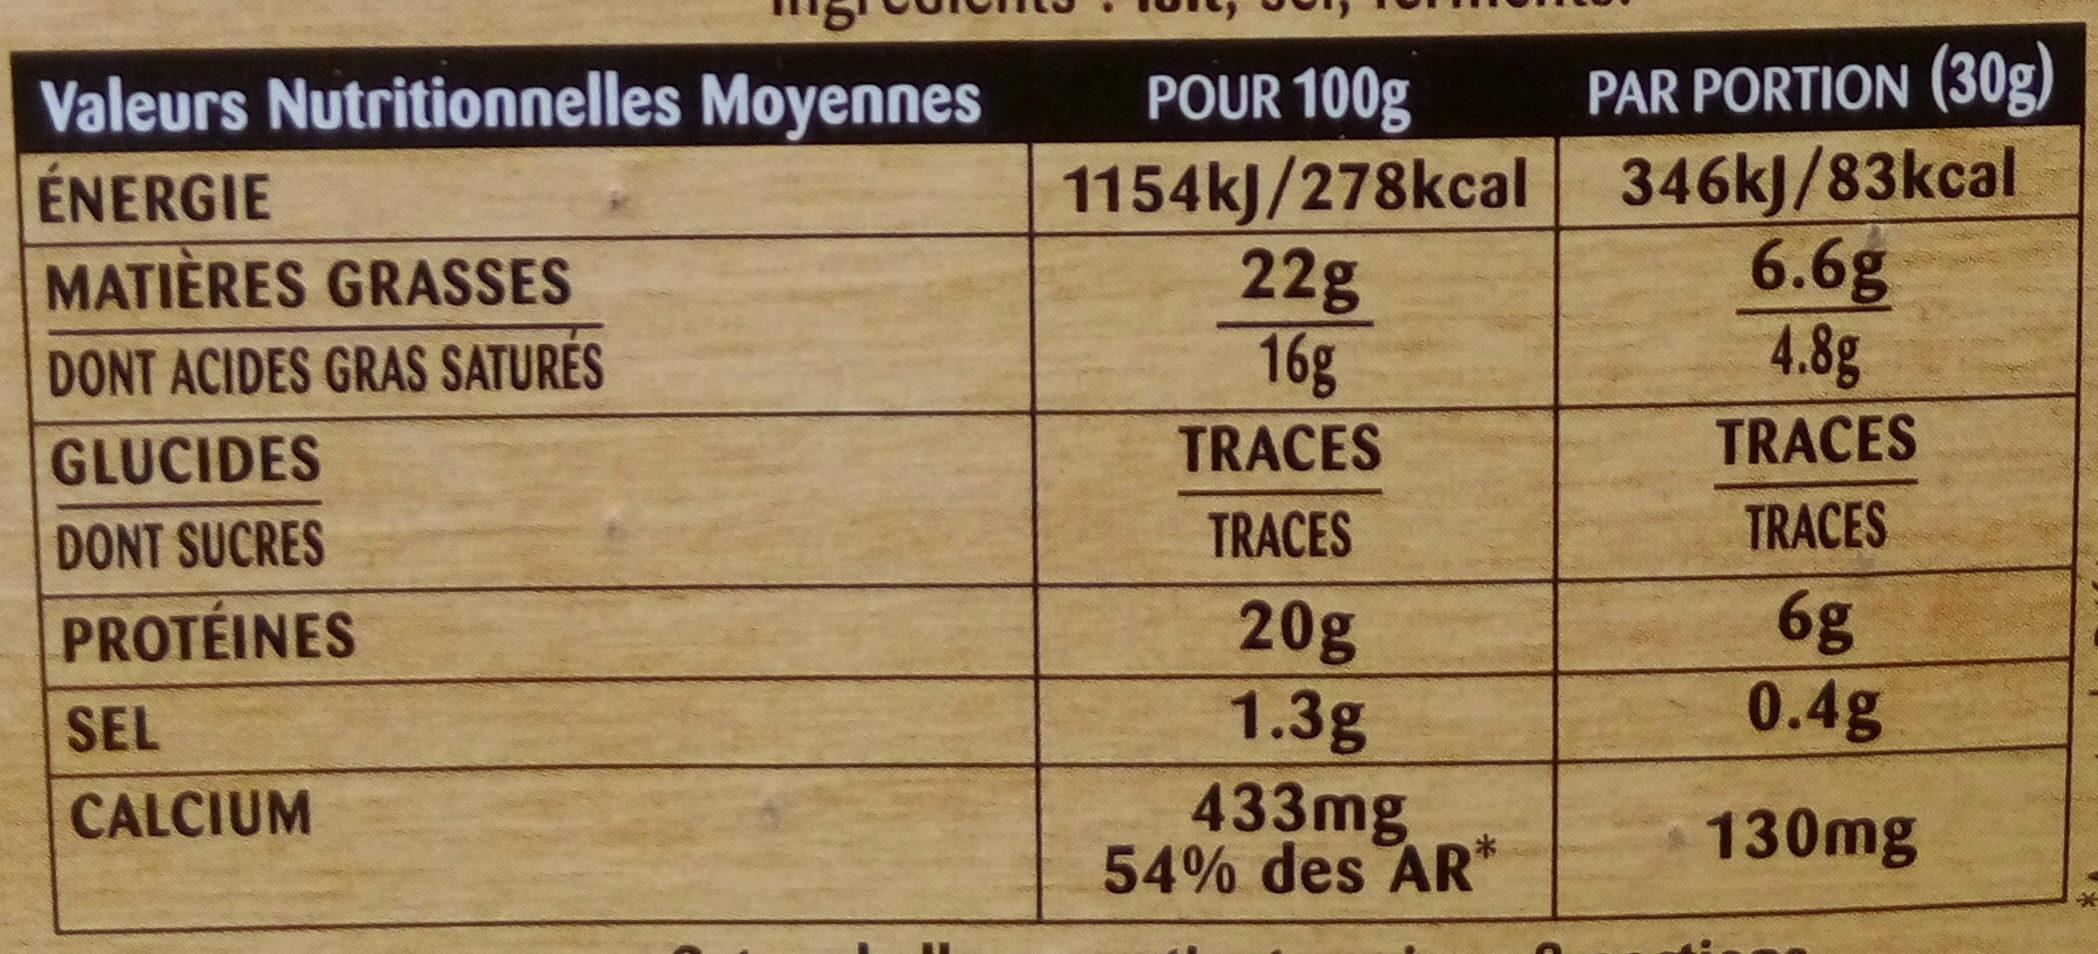 Camembert de Campagne - Informations nutritionnelles - fr